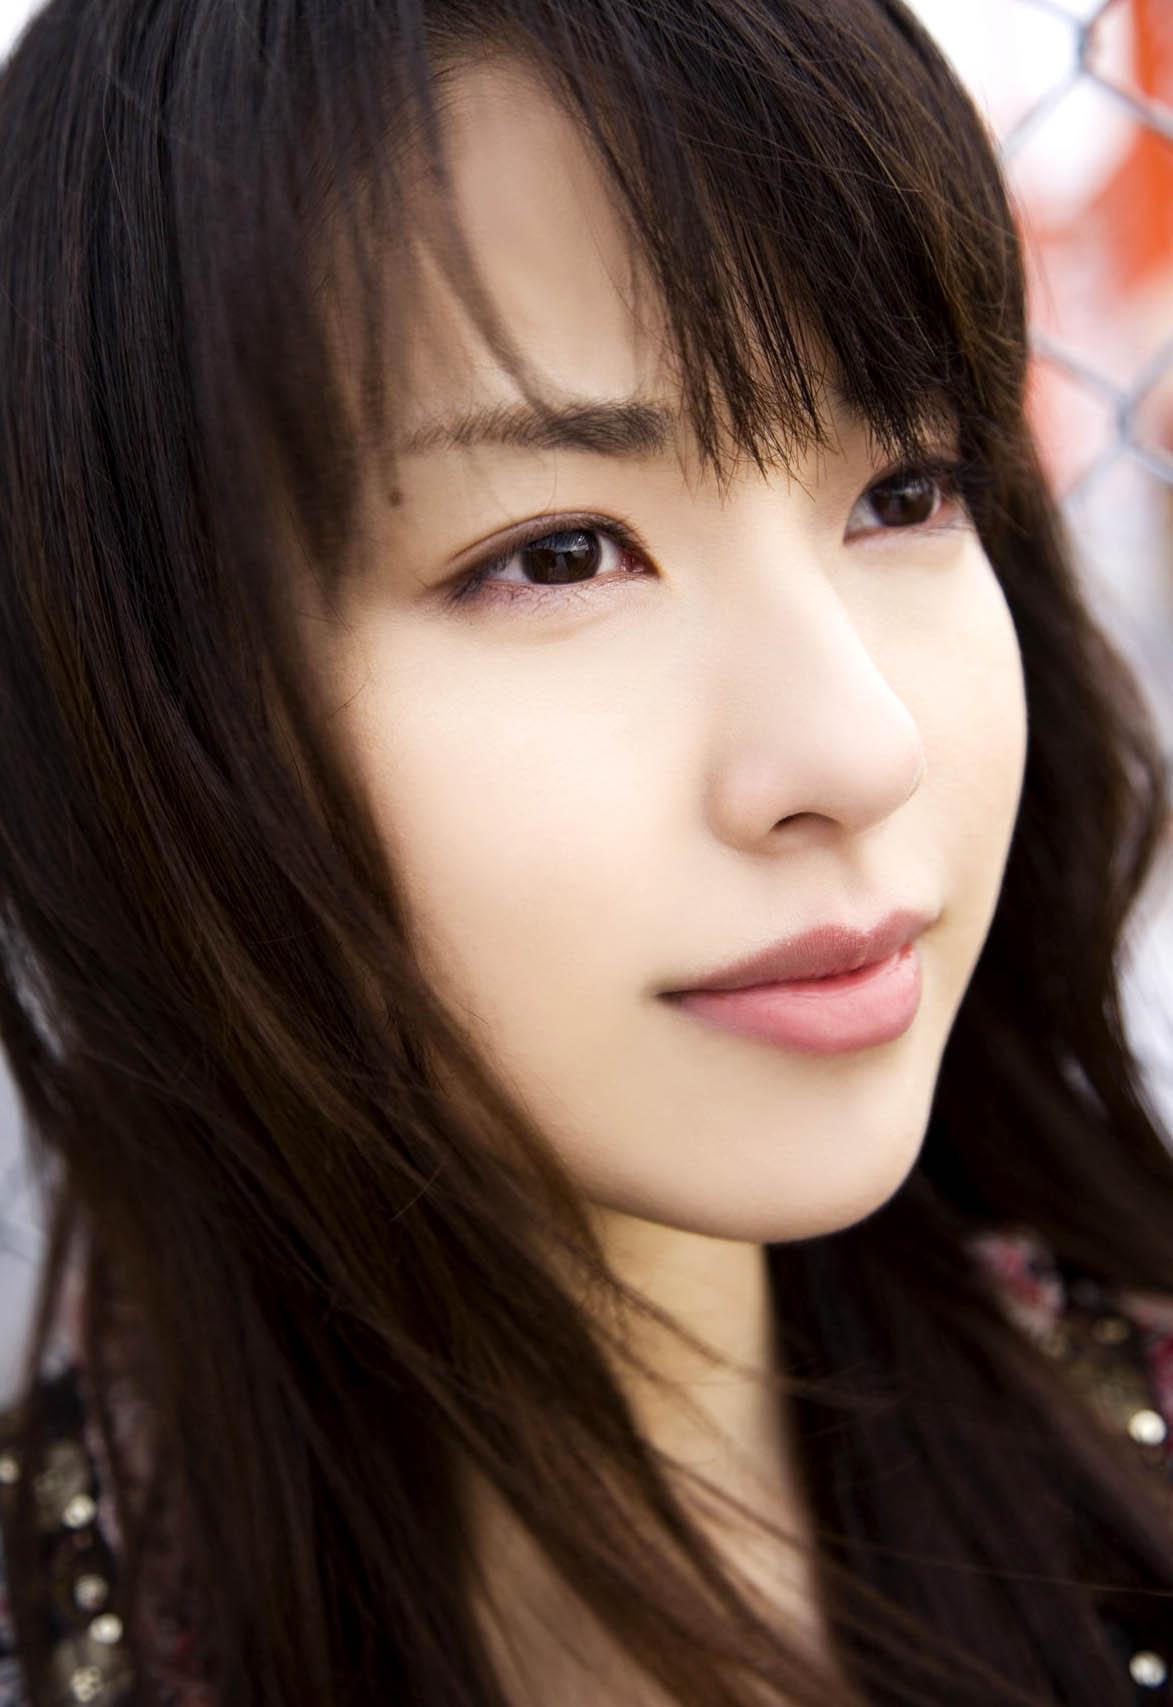 Erika Toda #1